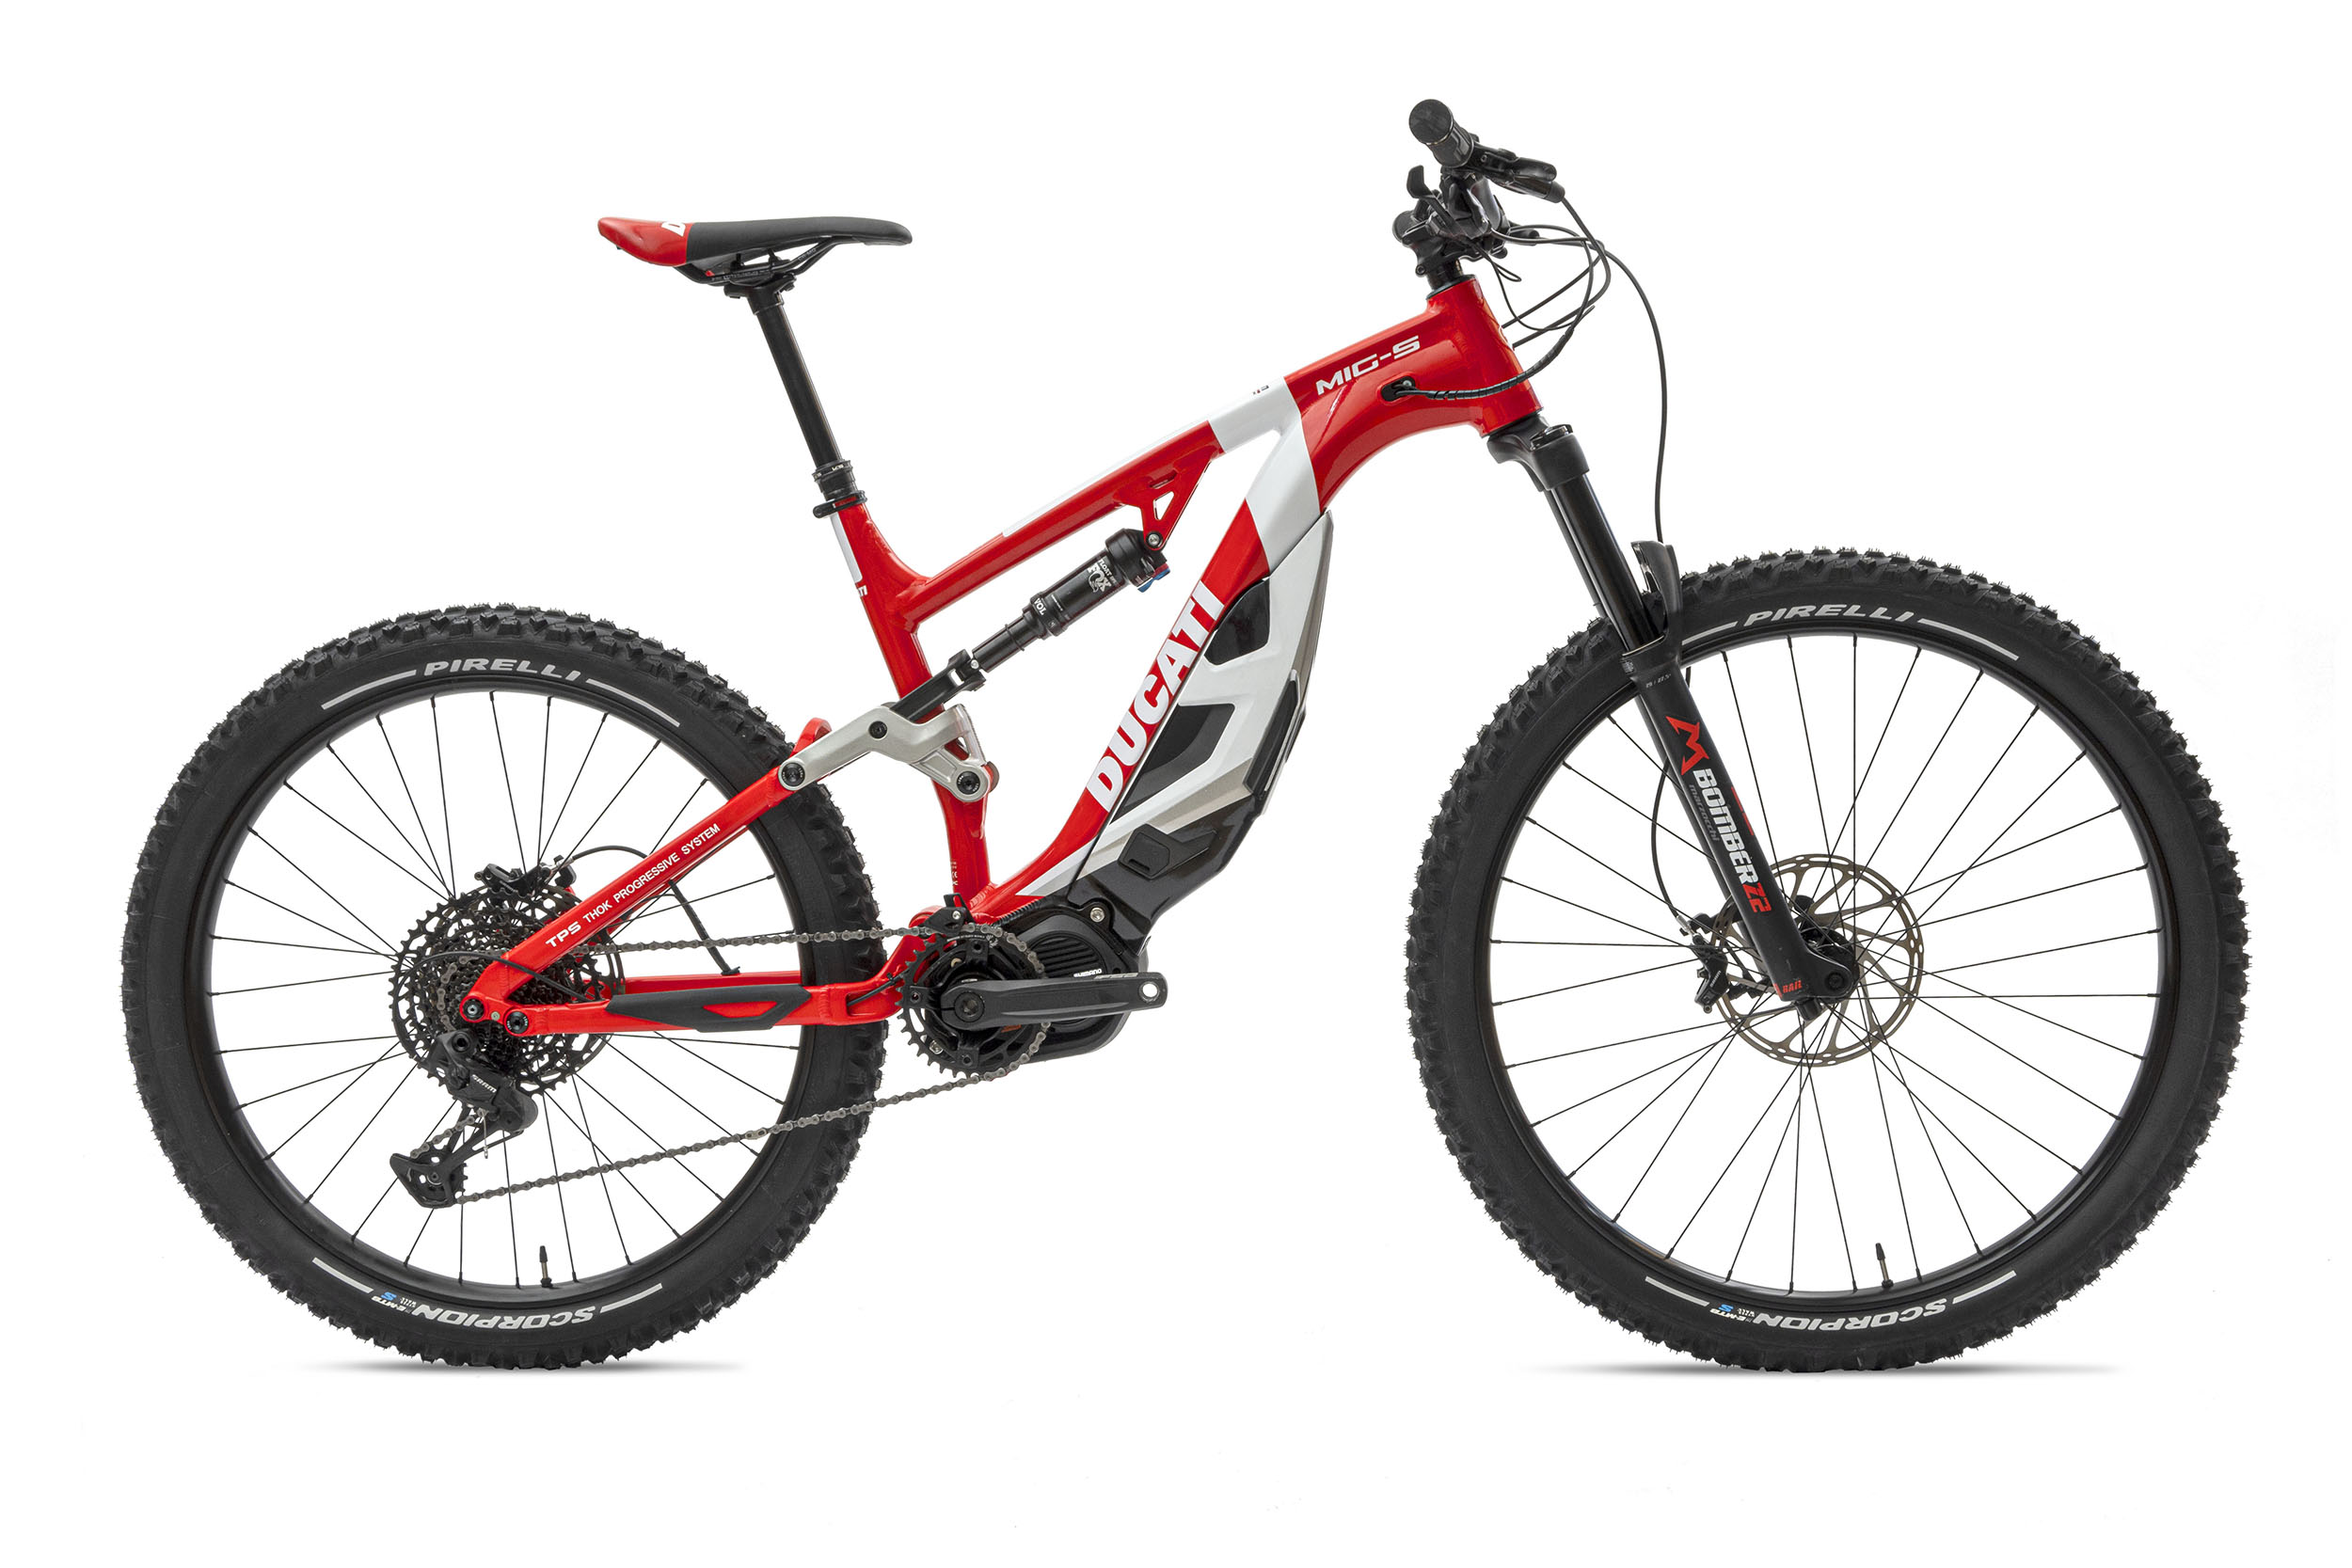 201118 Ducati_MIG-S _1__UC211405_High